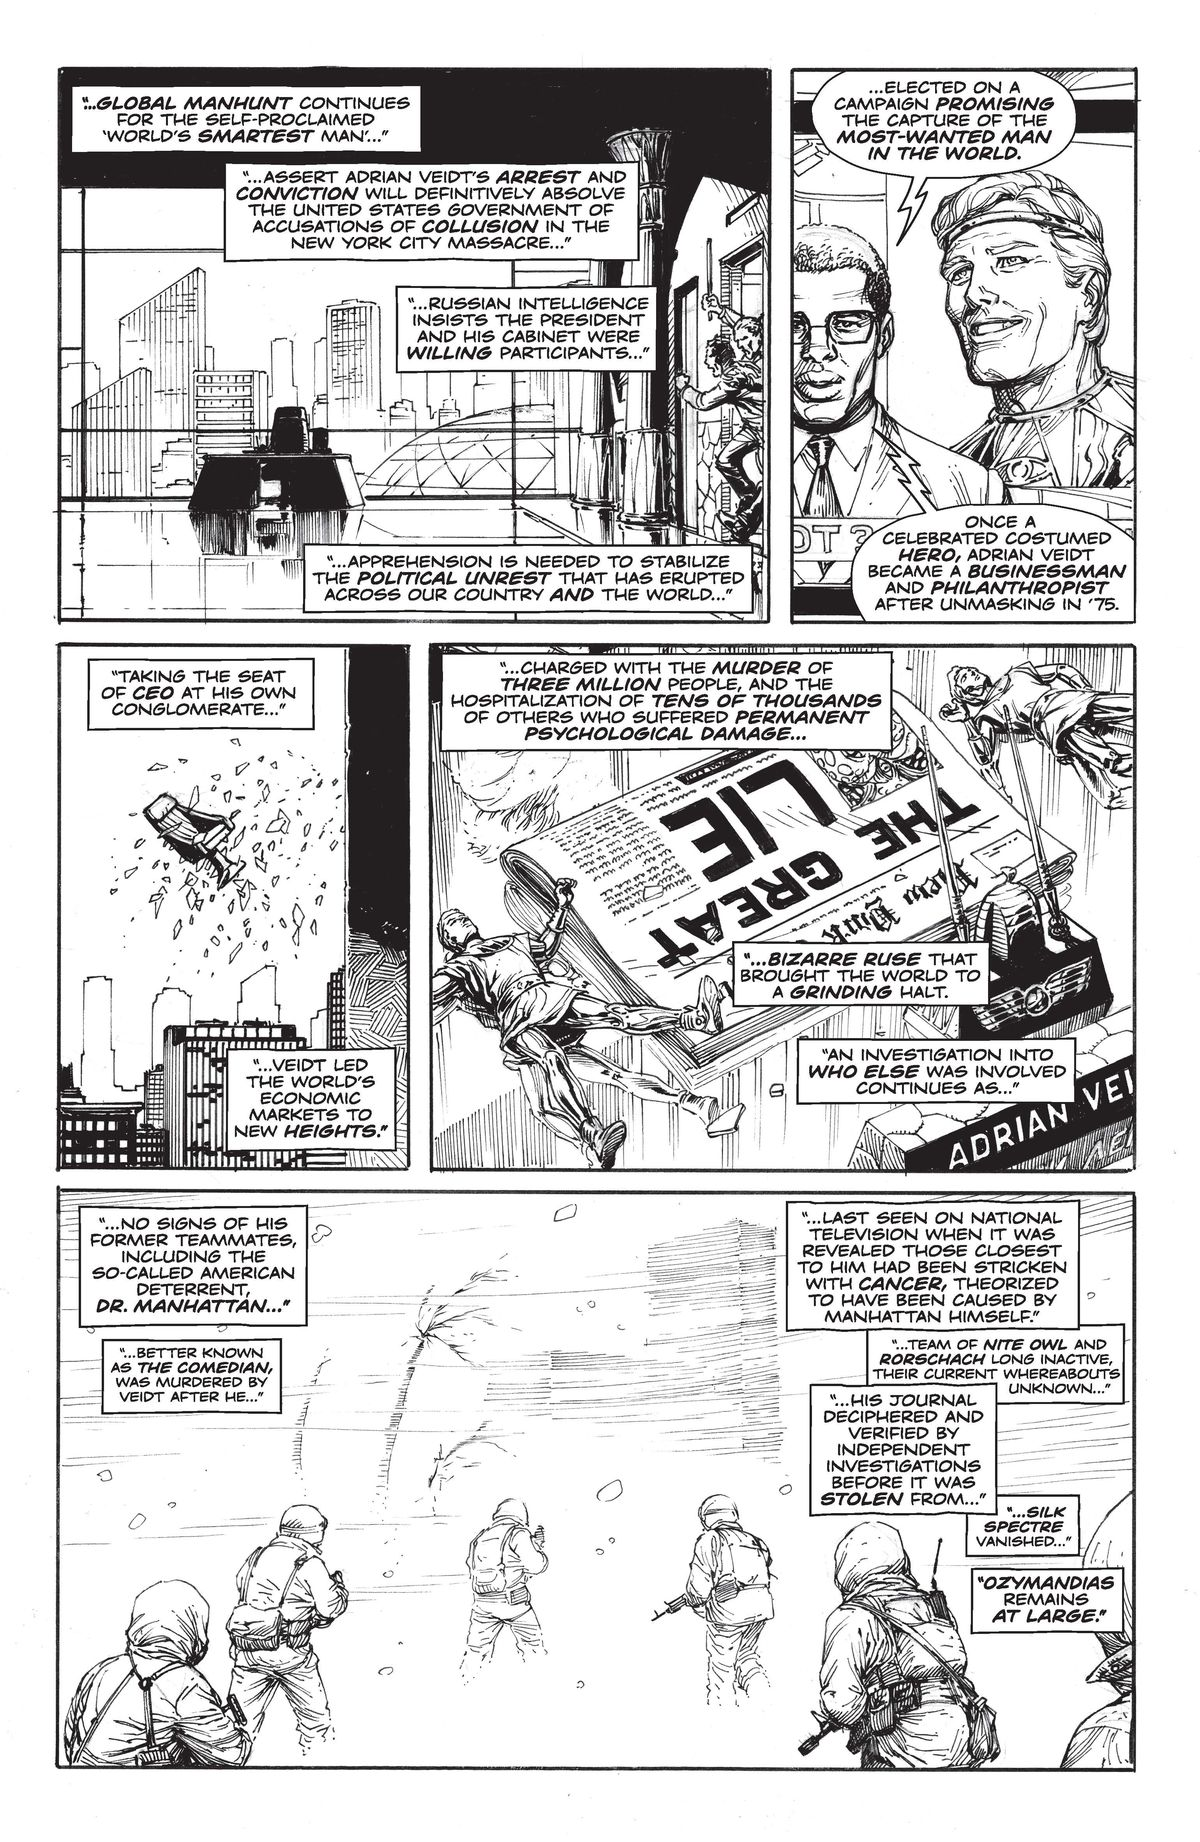 DC Comics' Doomsday Clock #1, page 3, written by Geoff Loeb, drawn by Gary Frank.